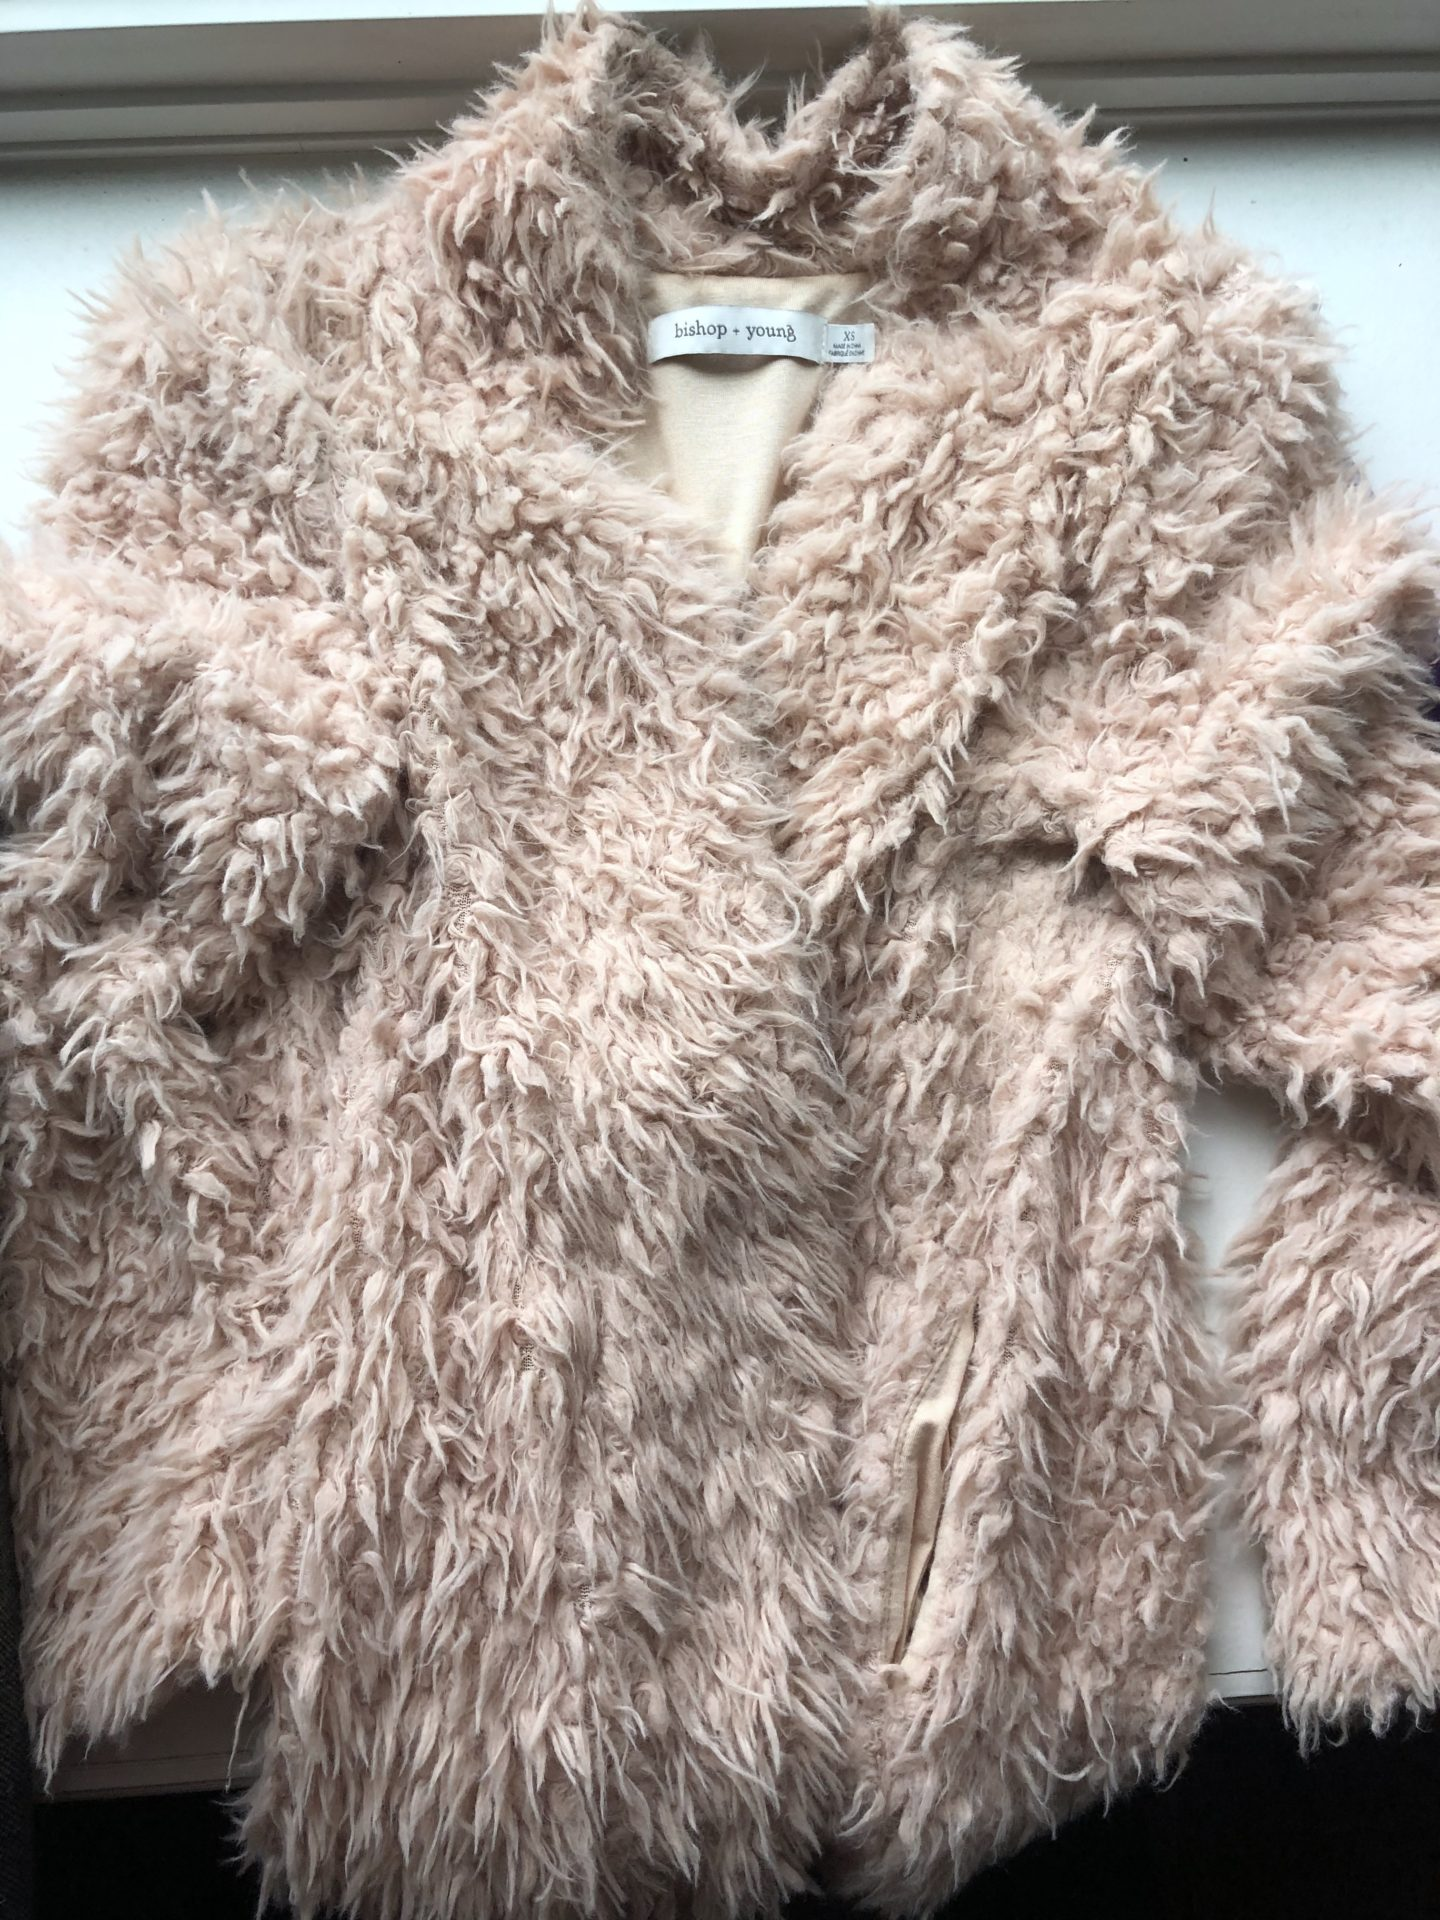 Bringing life back into my faux fur cardigan that looks like road kill